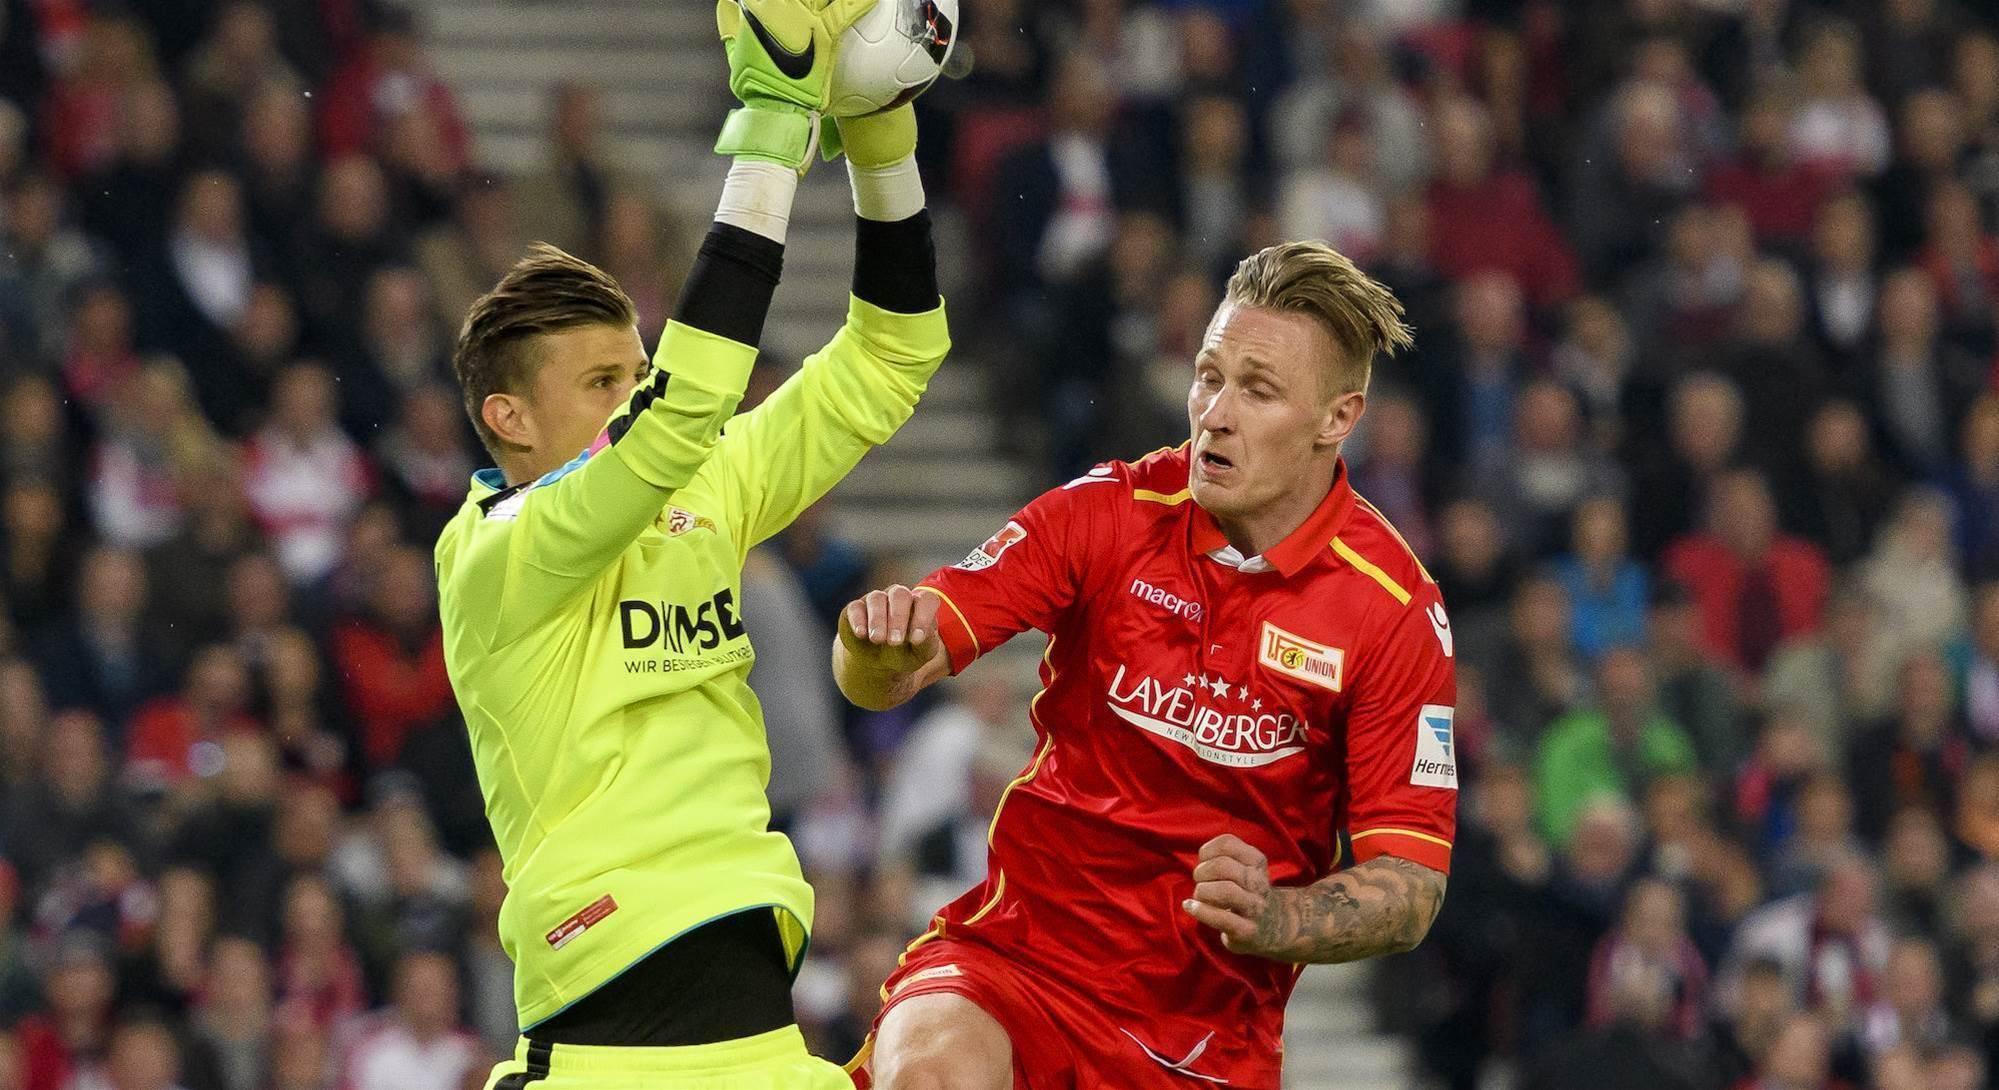 Langerak closer to promotion